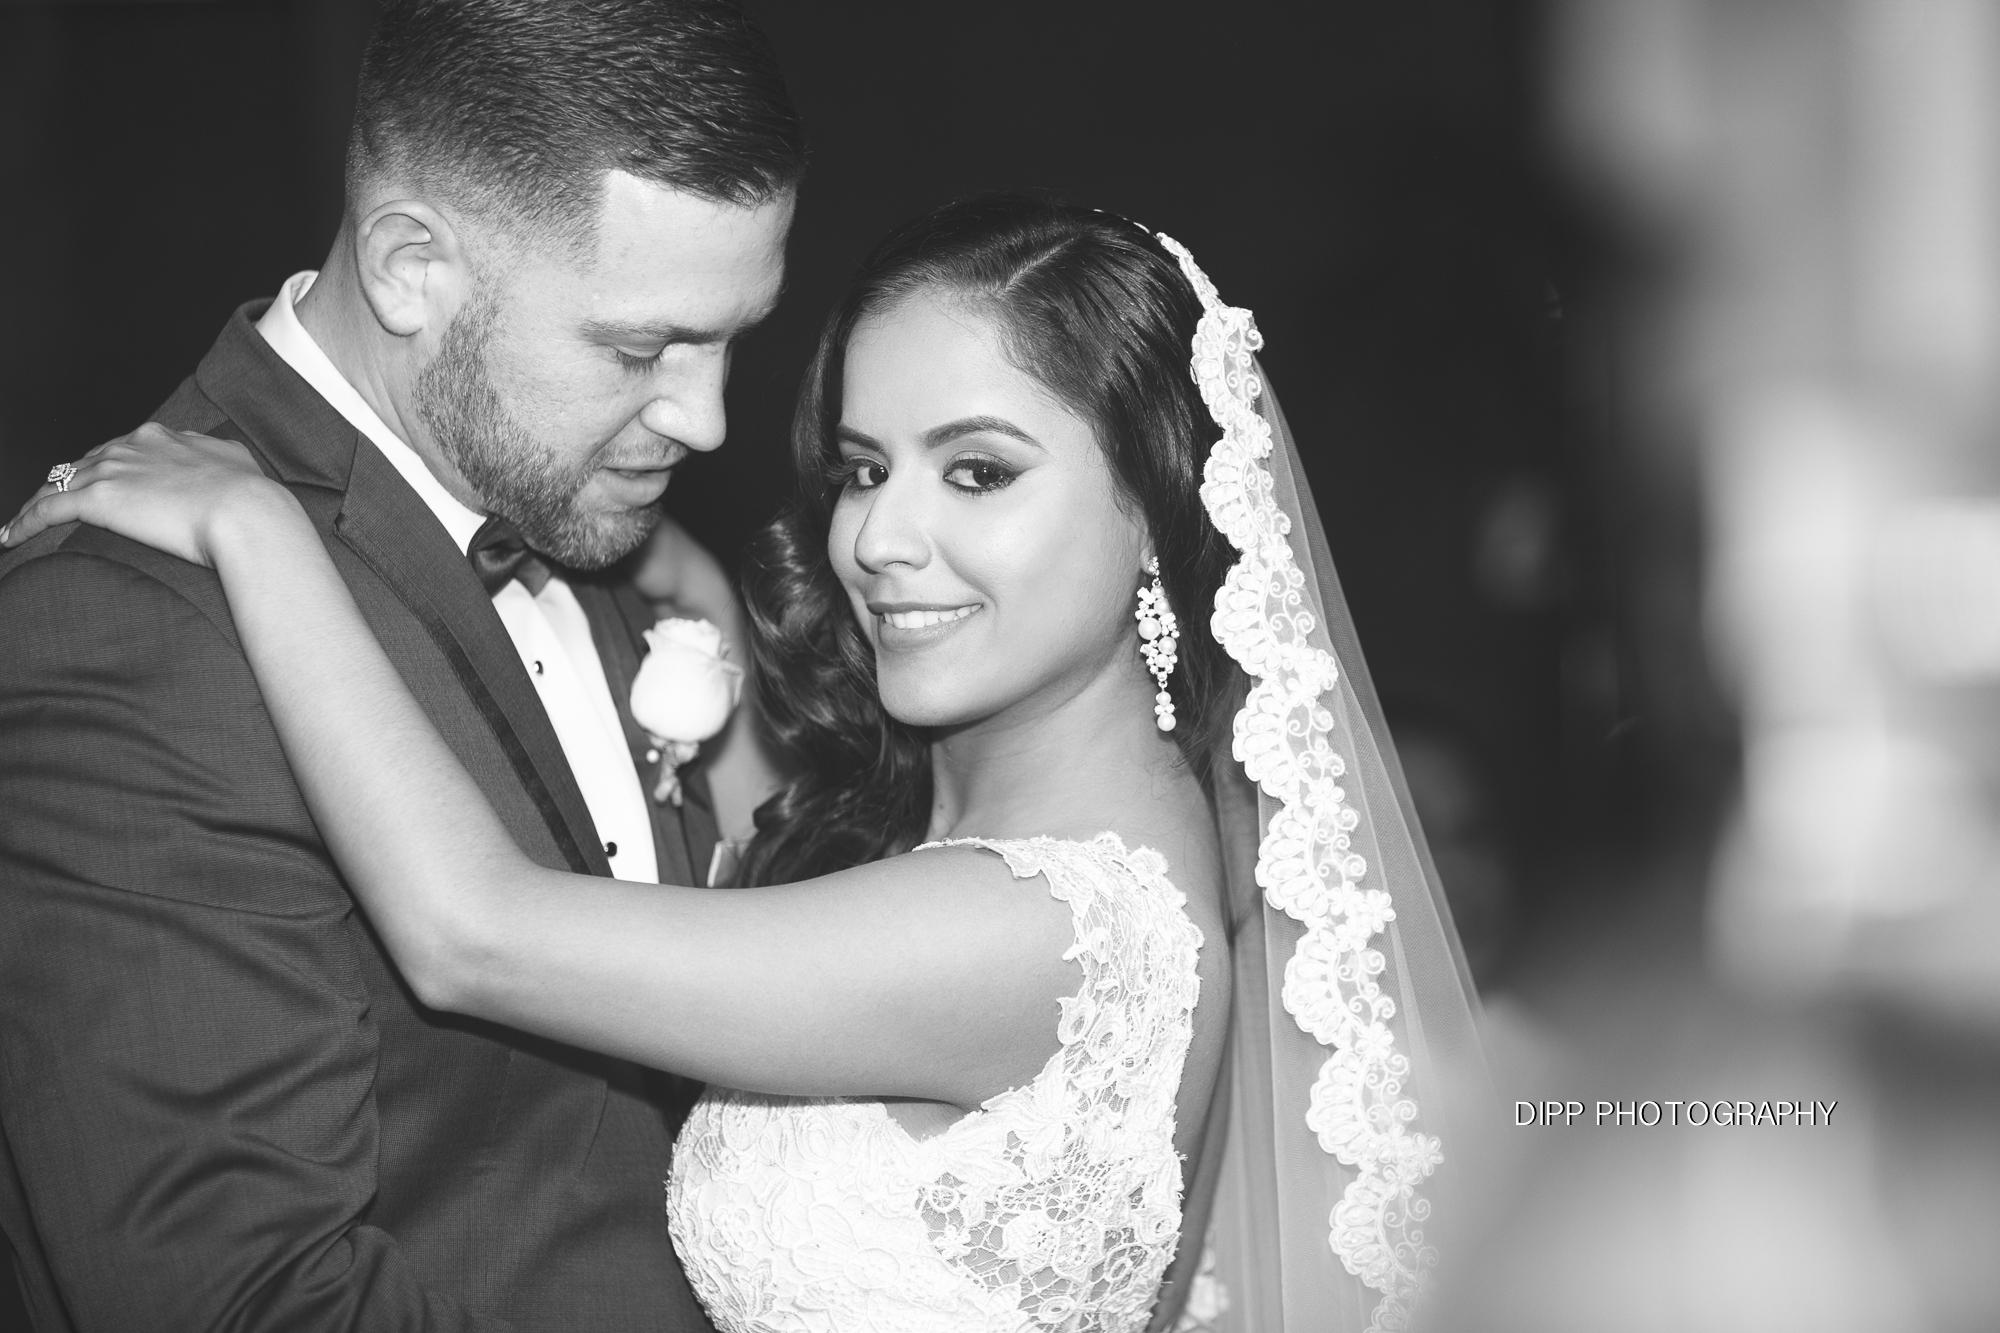 Dipp_2016 EDITED Melissa & Avilio Wedding-485